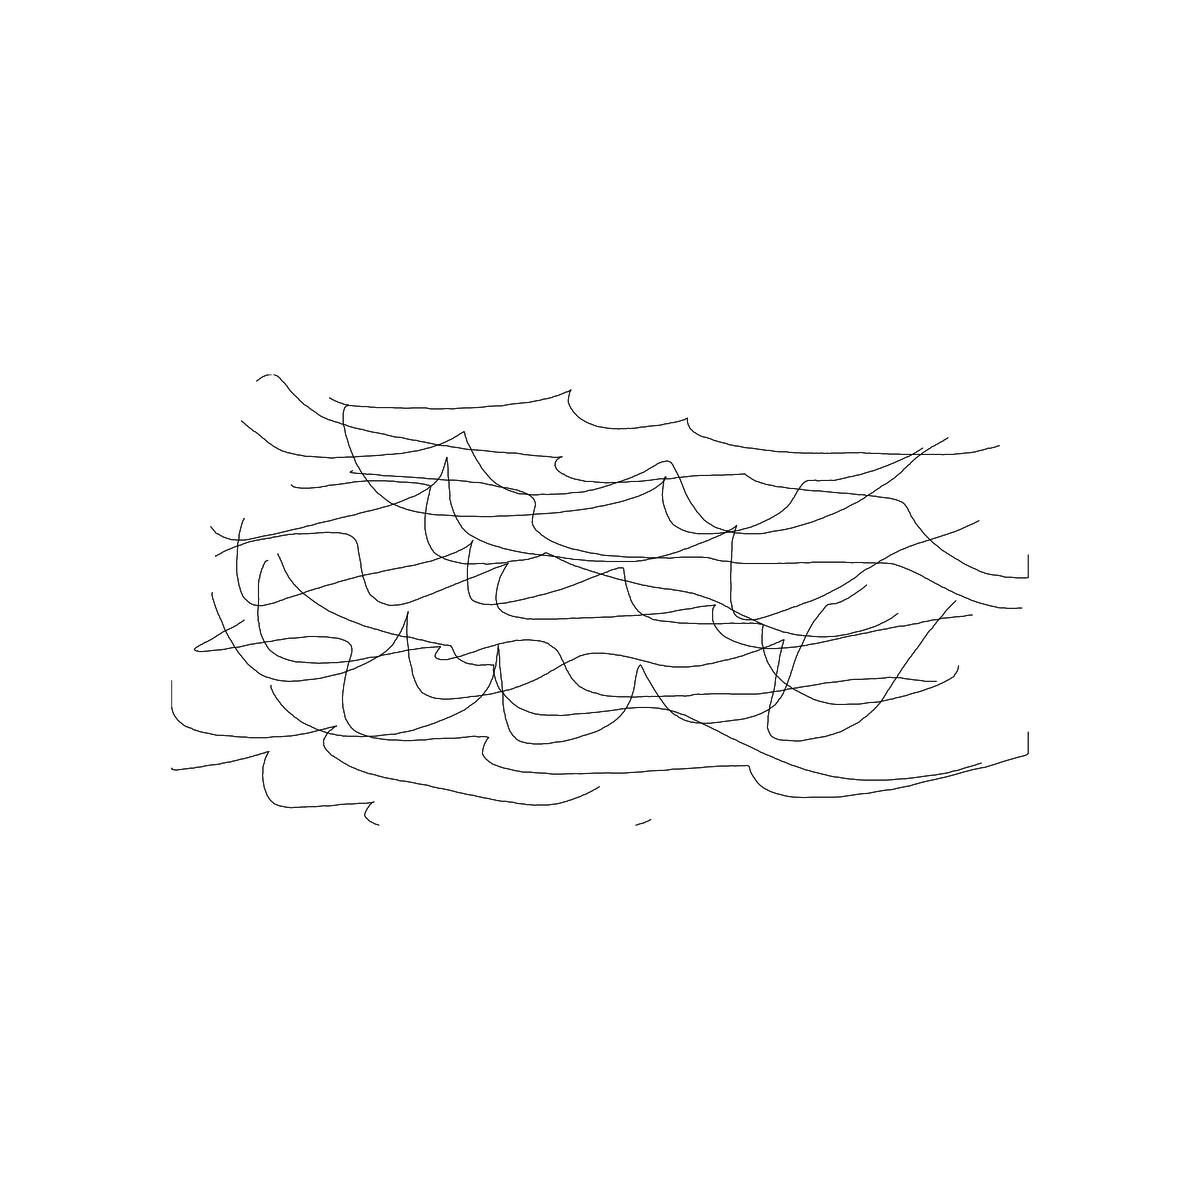 BAAAM drawing#23459 lat:50.9738388061523440lng: 1.8384146690368652